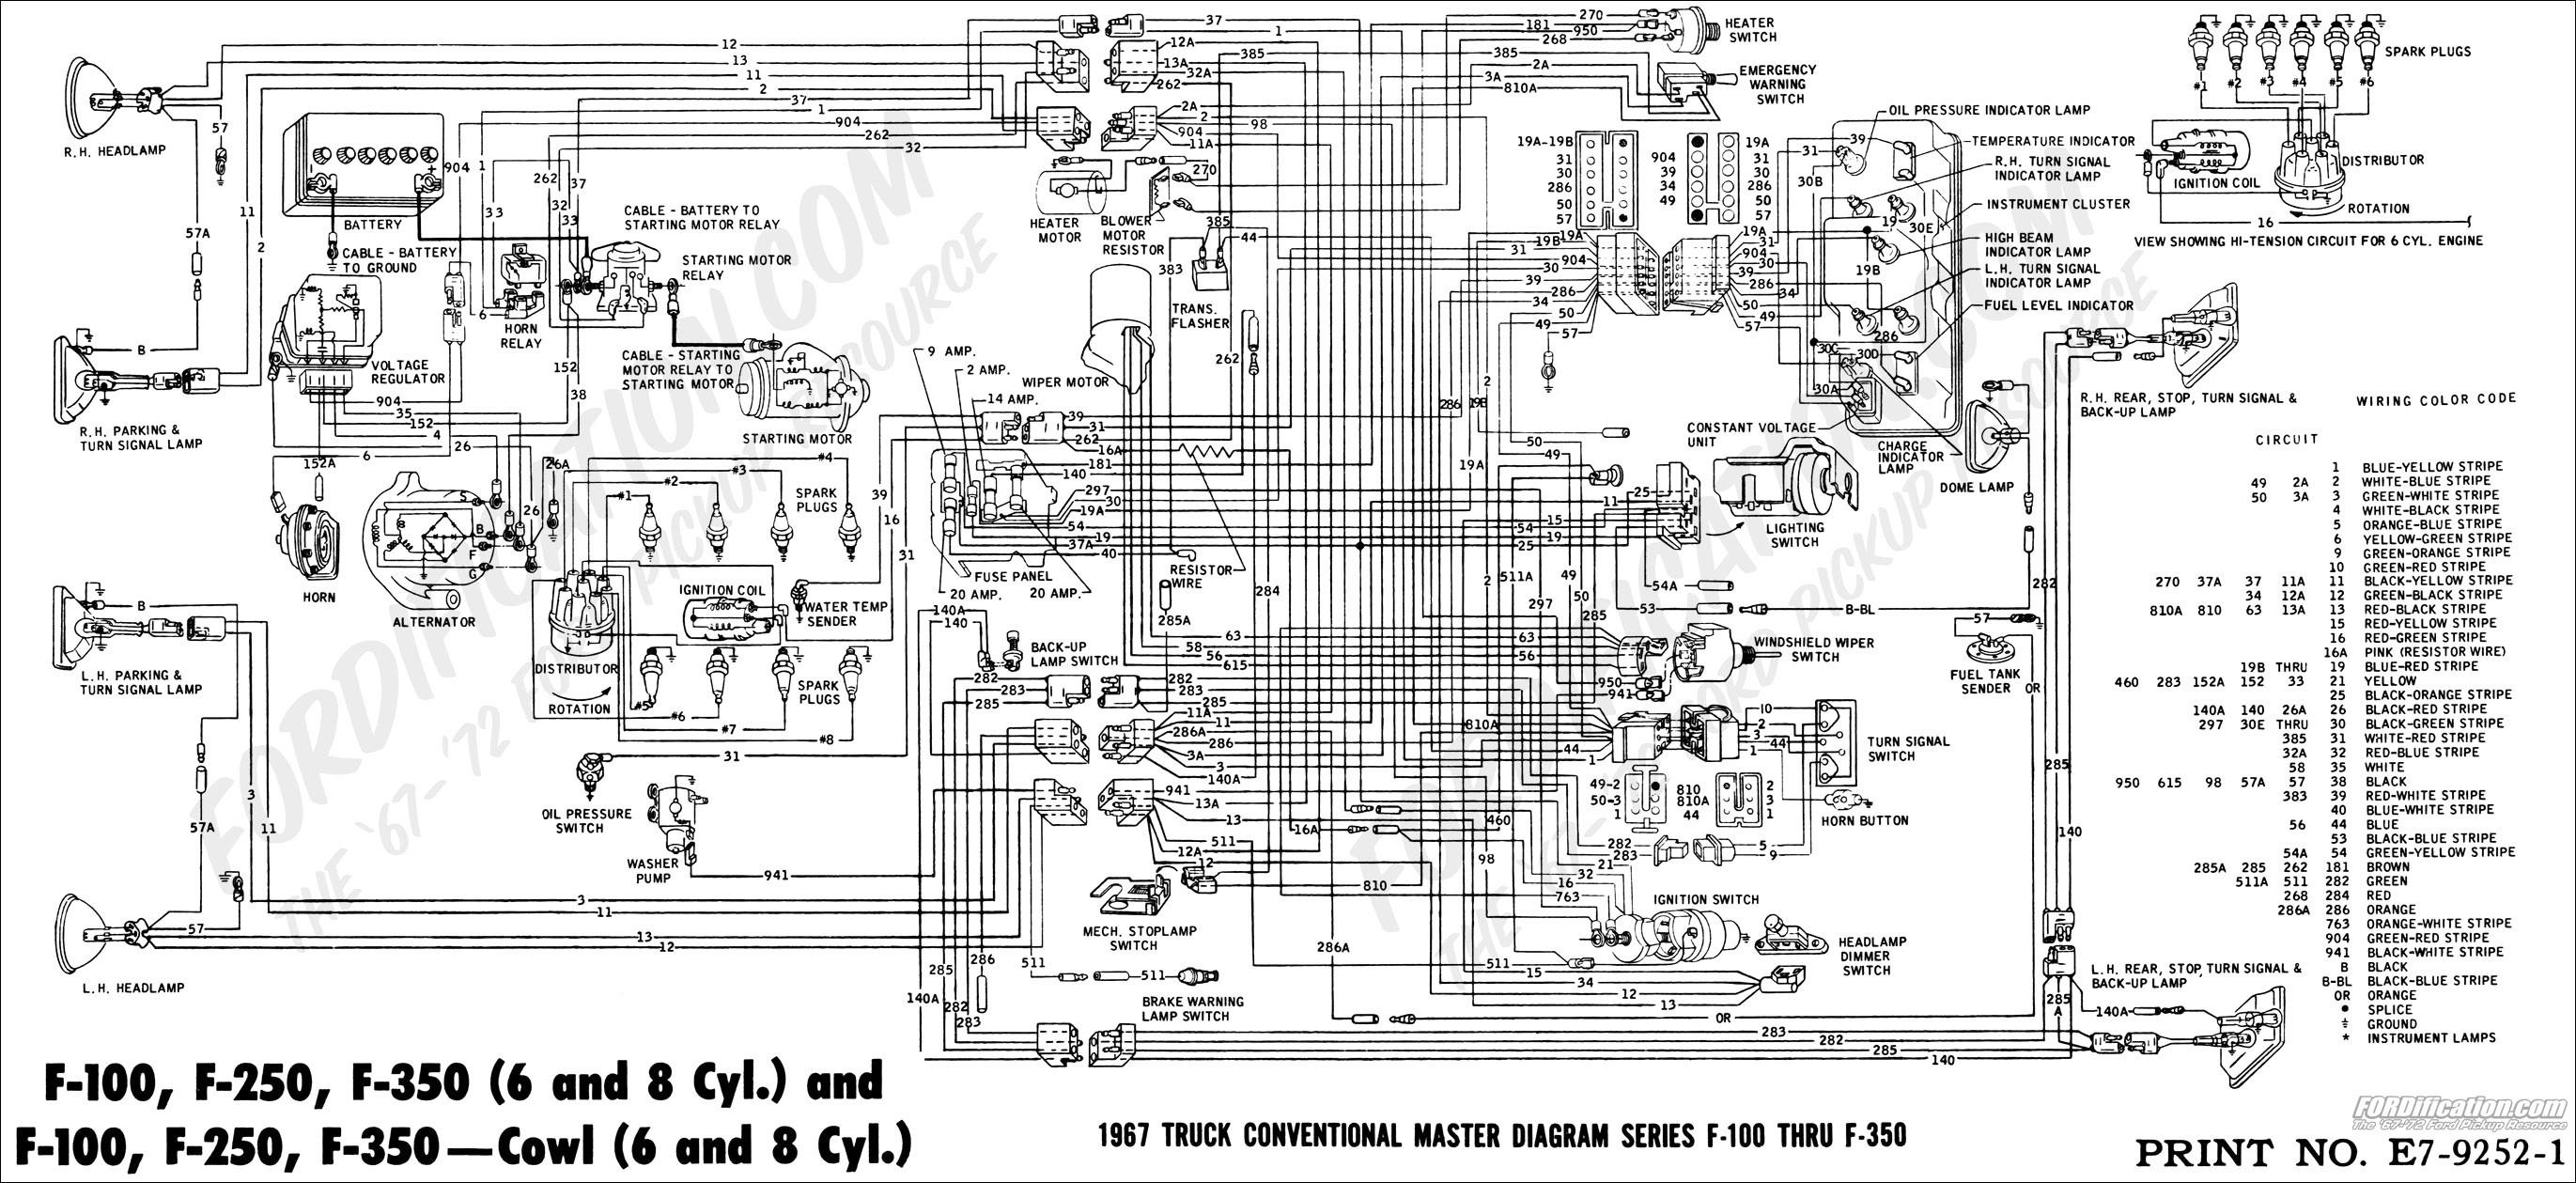 1991 f250 wiring diagram 18 18 fearless wonder de \u2022 93 f150 wiper wiring 16 7 ulrich temme de u2022 rh 16 7 ulrich temme de 1991 ford mustang wiring diagram 1991 ford ranger wiring diagram